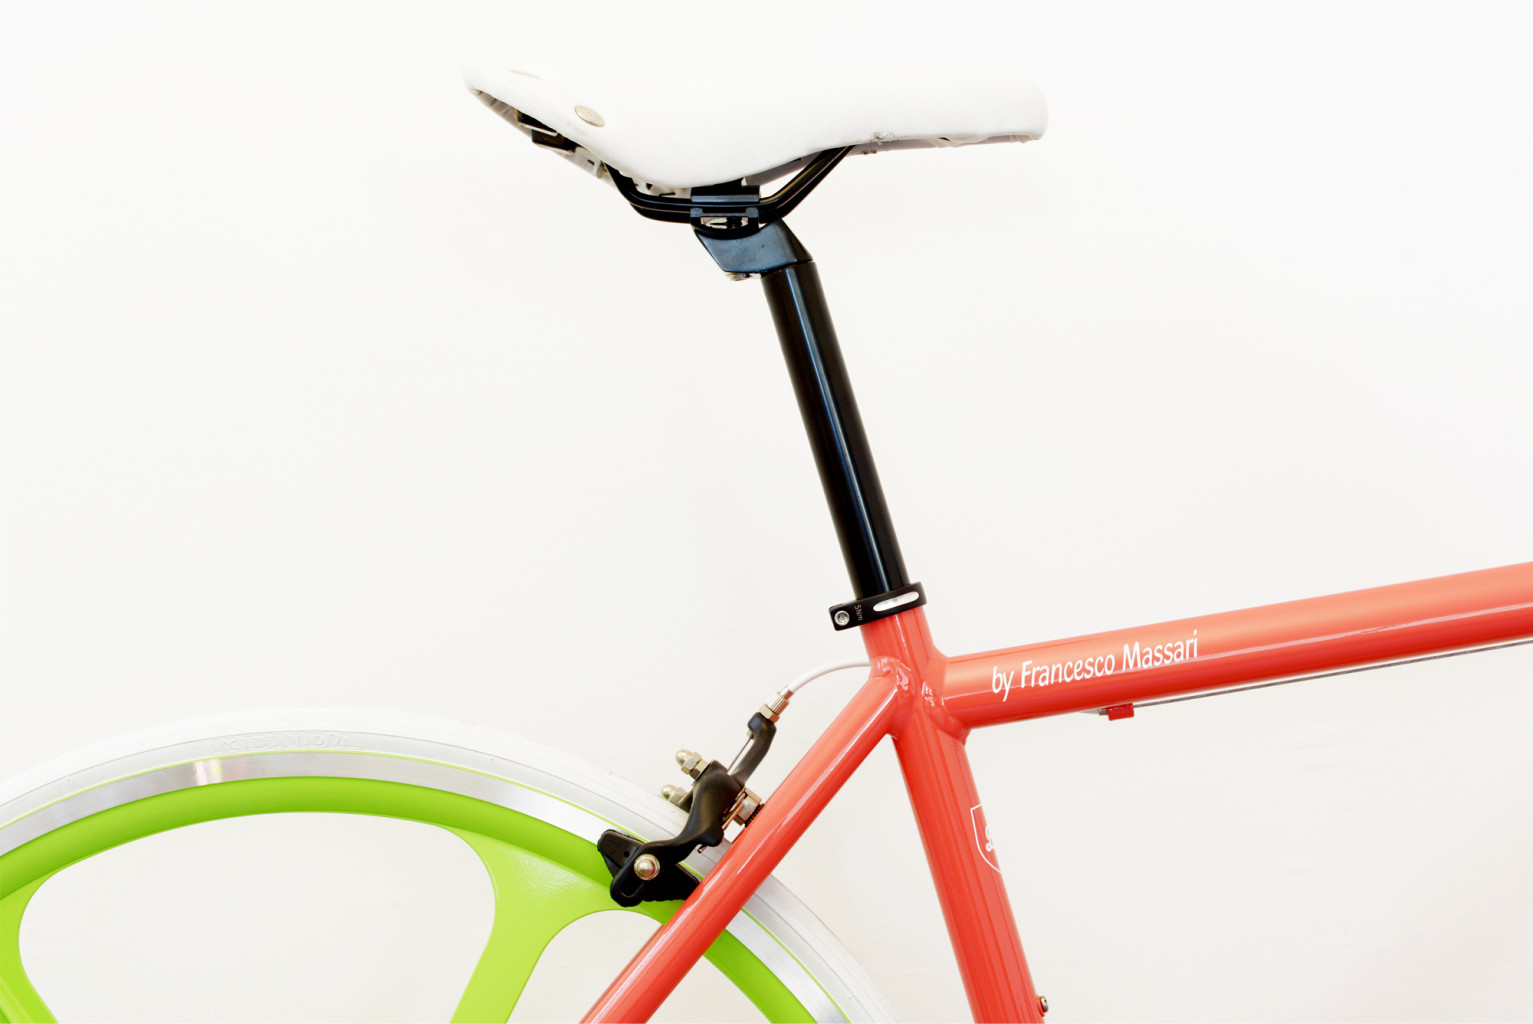 Bespoke bike 6